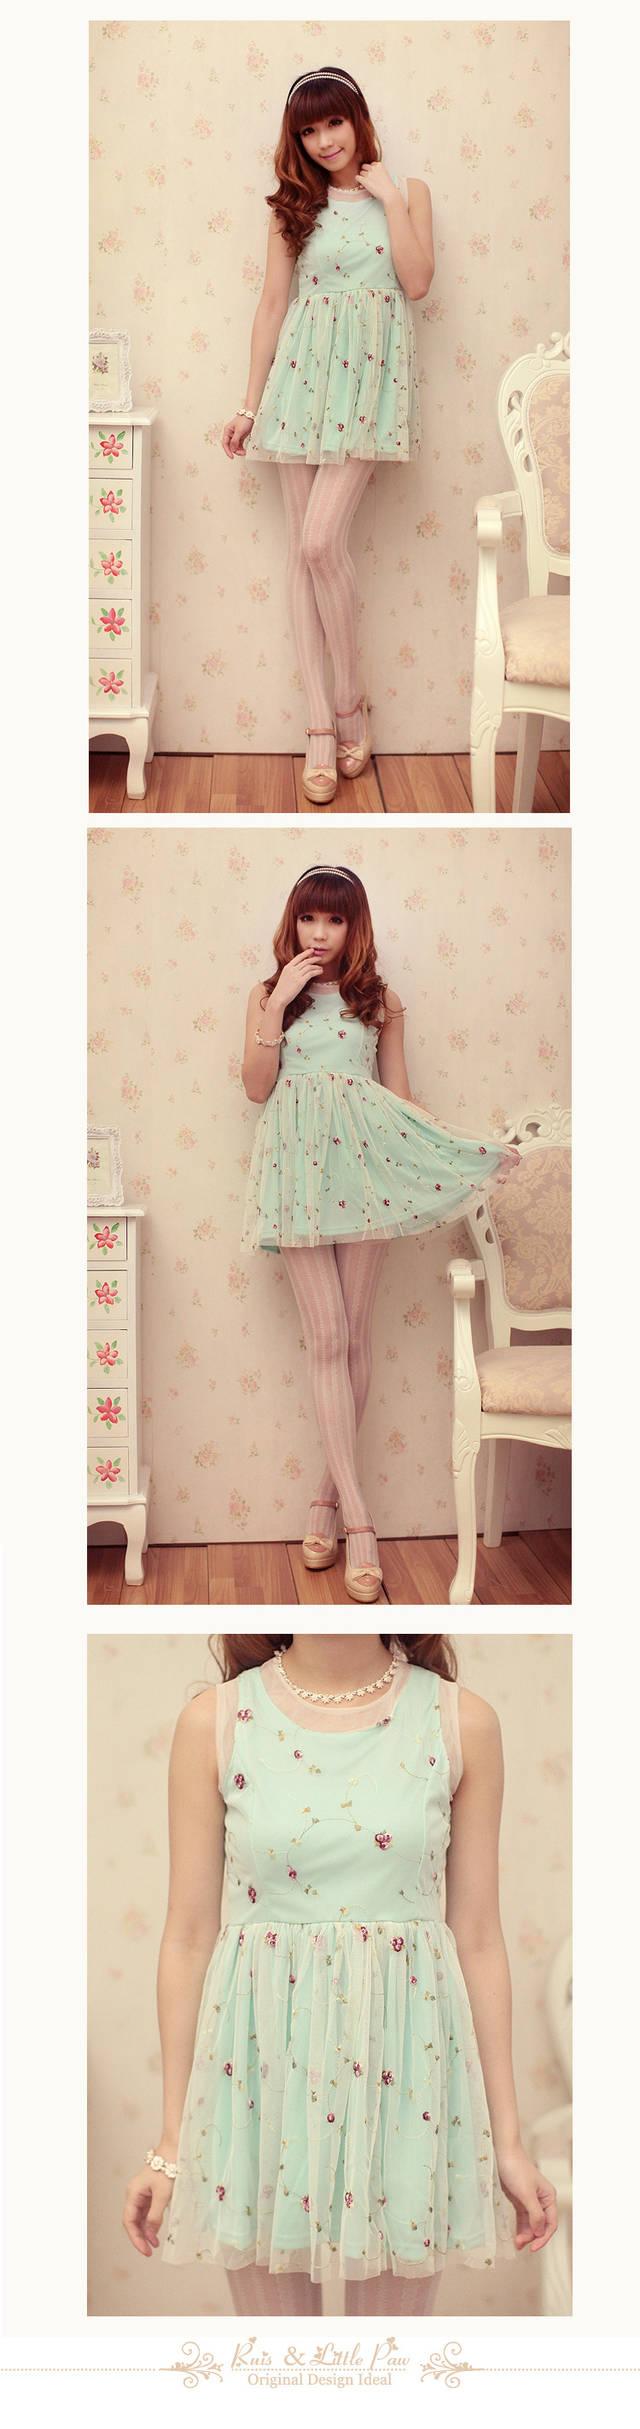 Kawaii Princess Cute Sweet Dolly Lolita Lace Rose Floral Sleeveless Dress Green